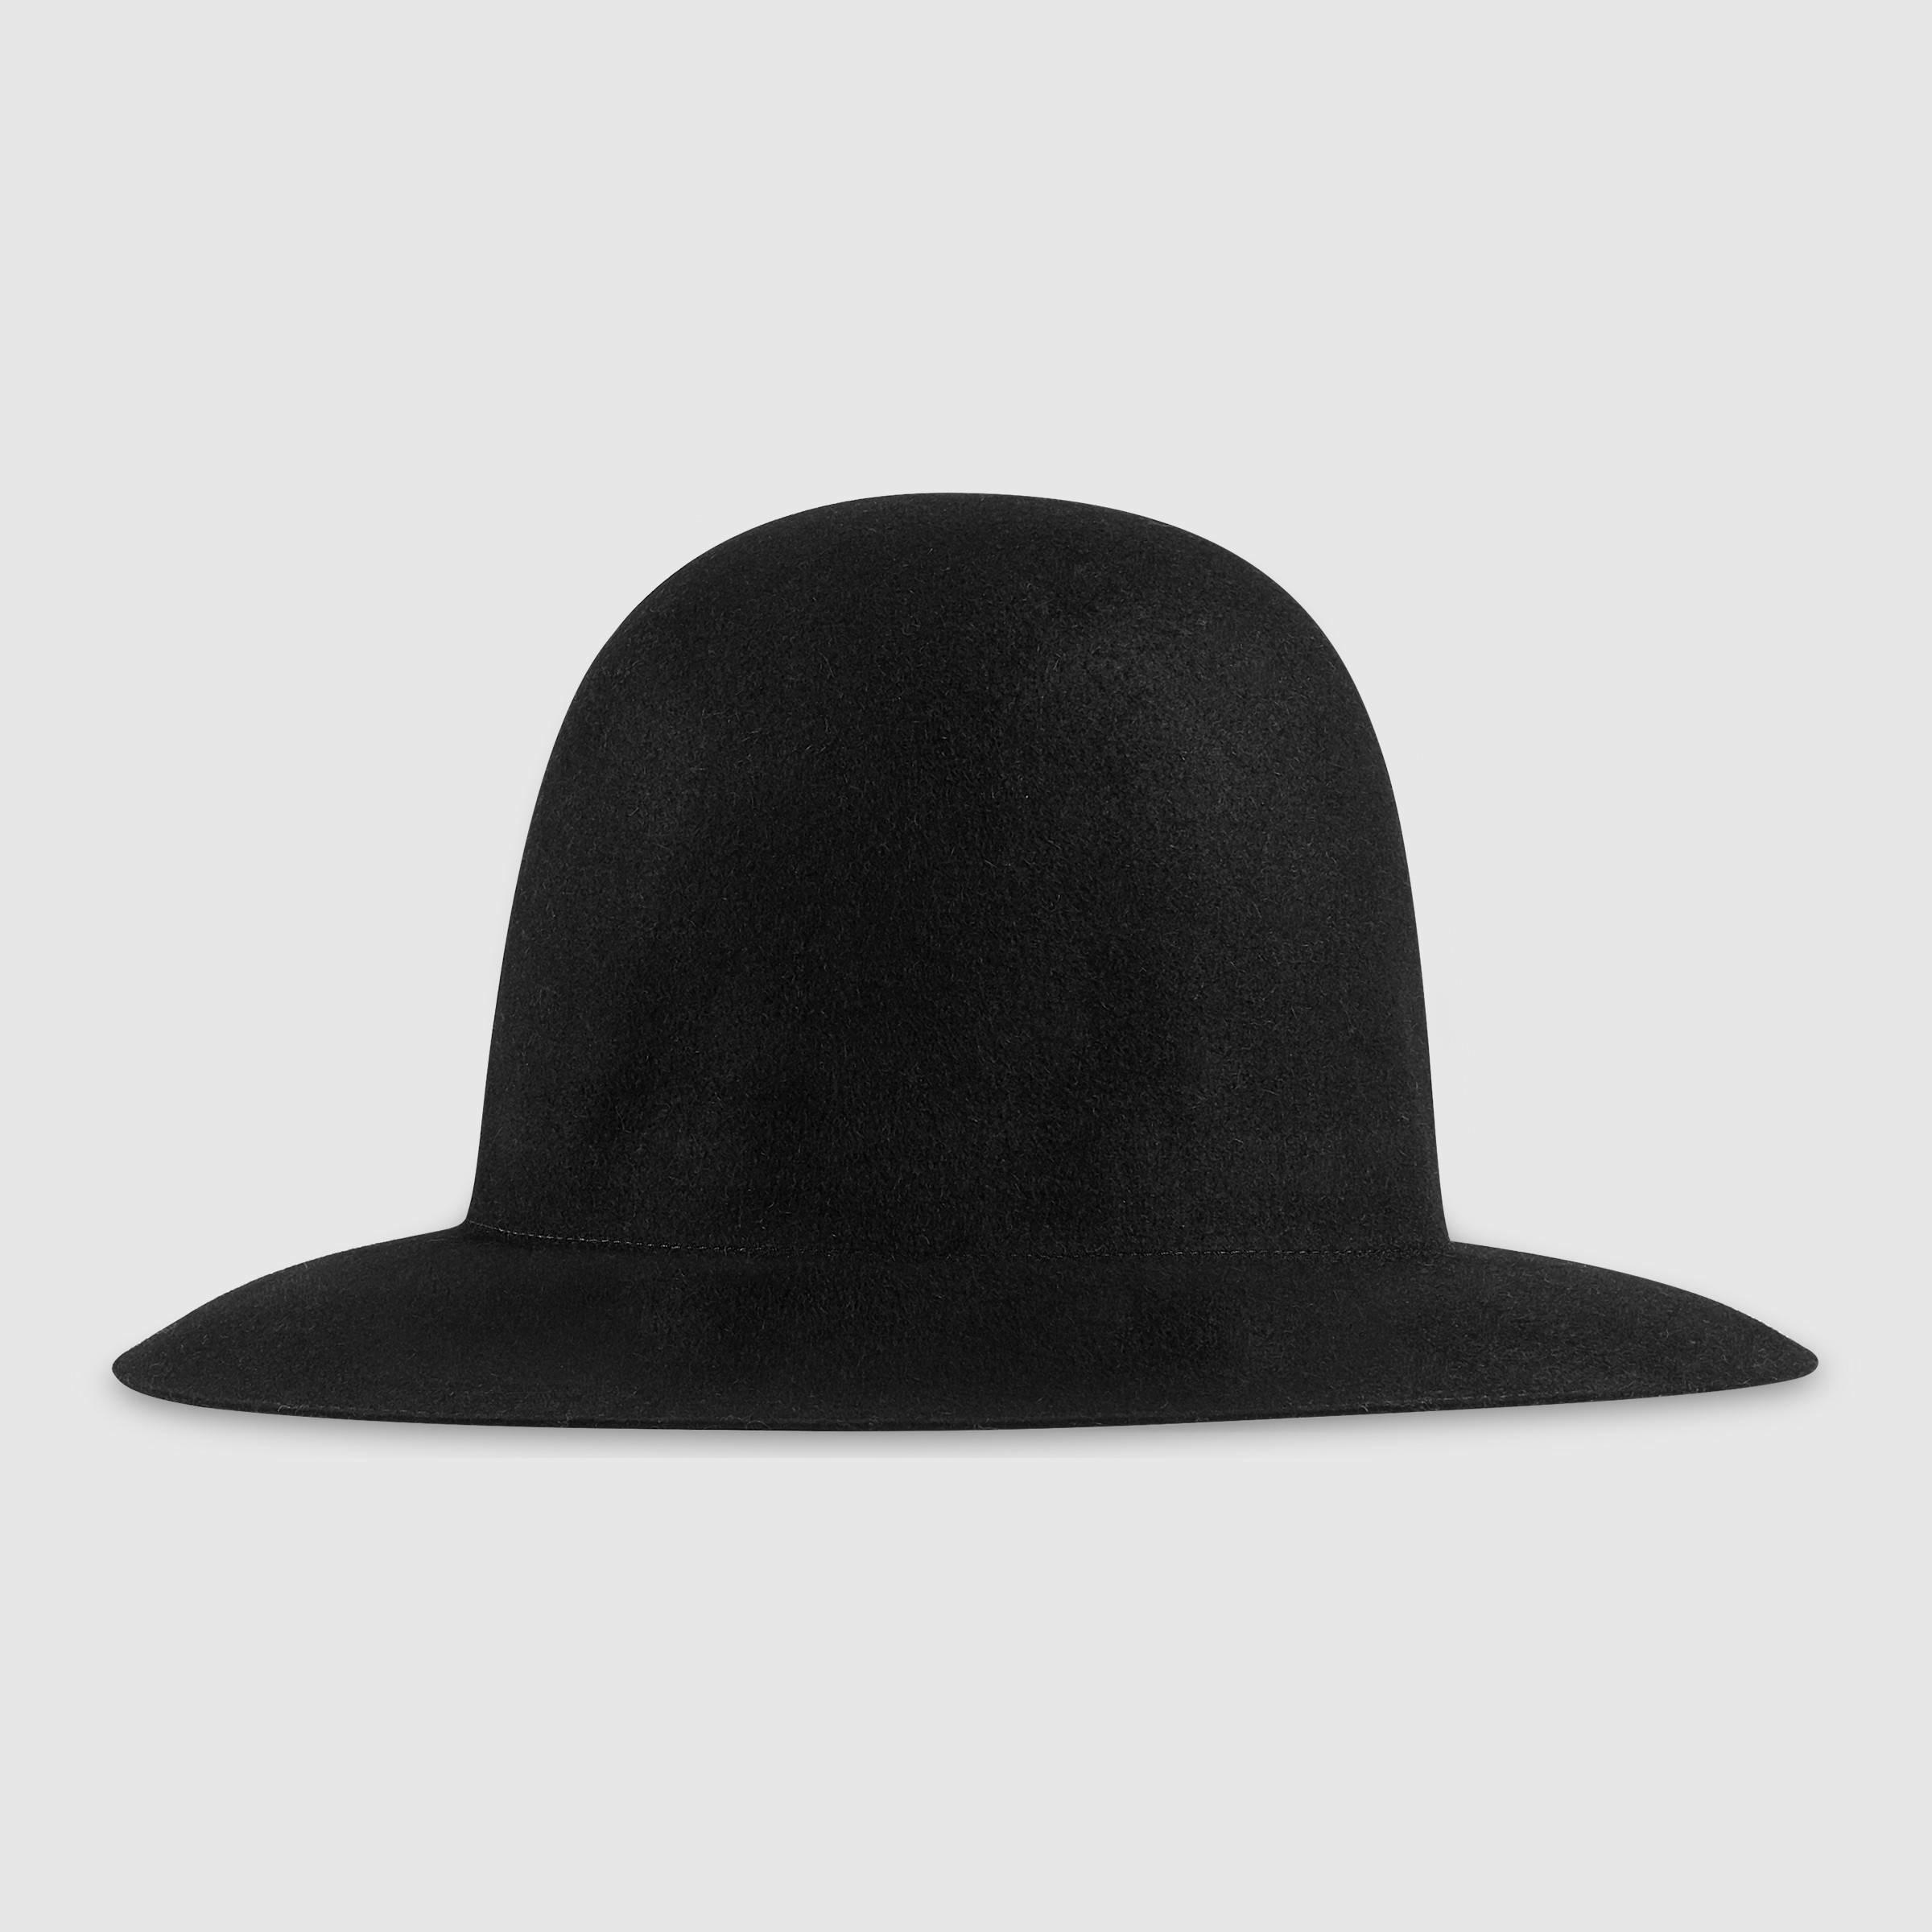 Gucci Hats For Men: Gucci Wide Brim Hat For Men